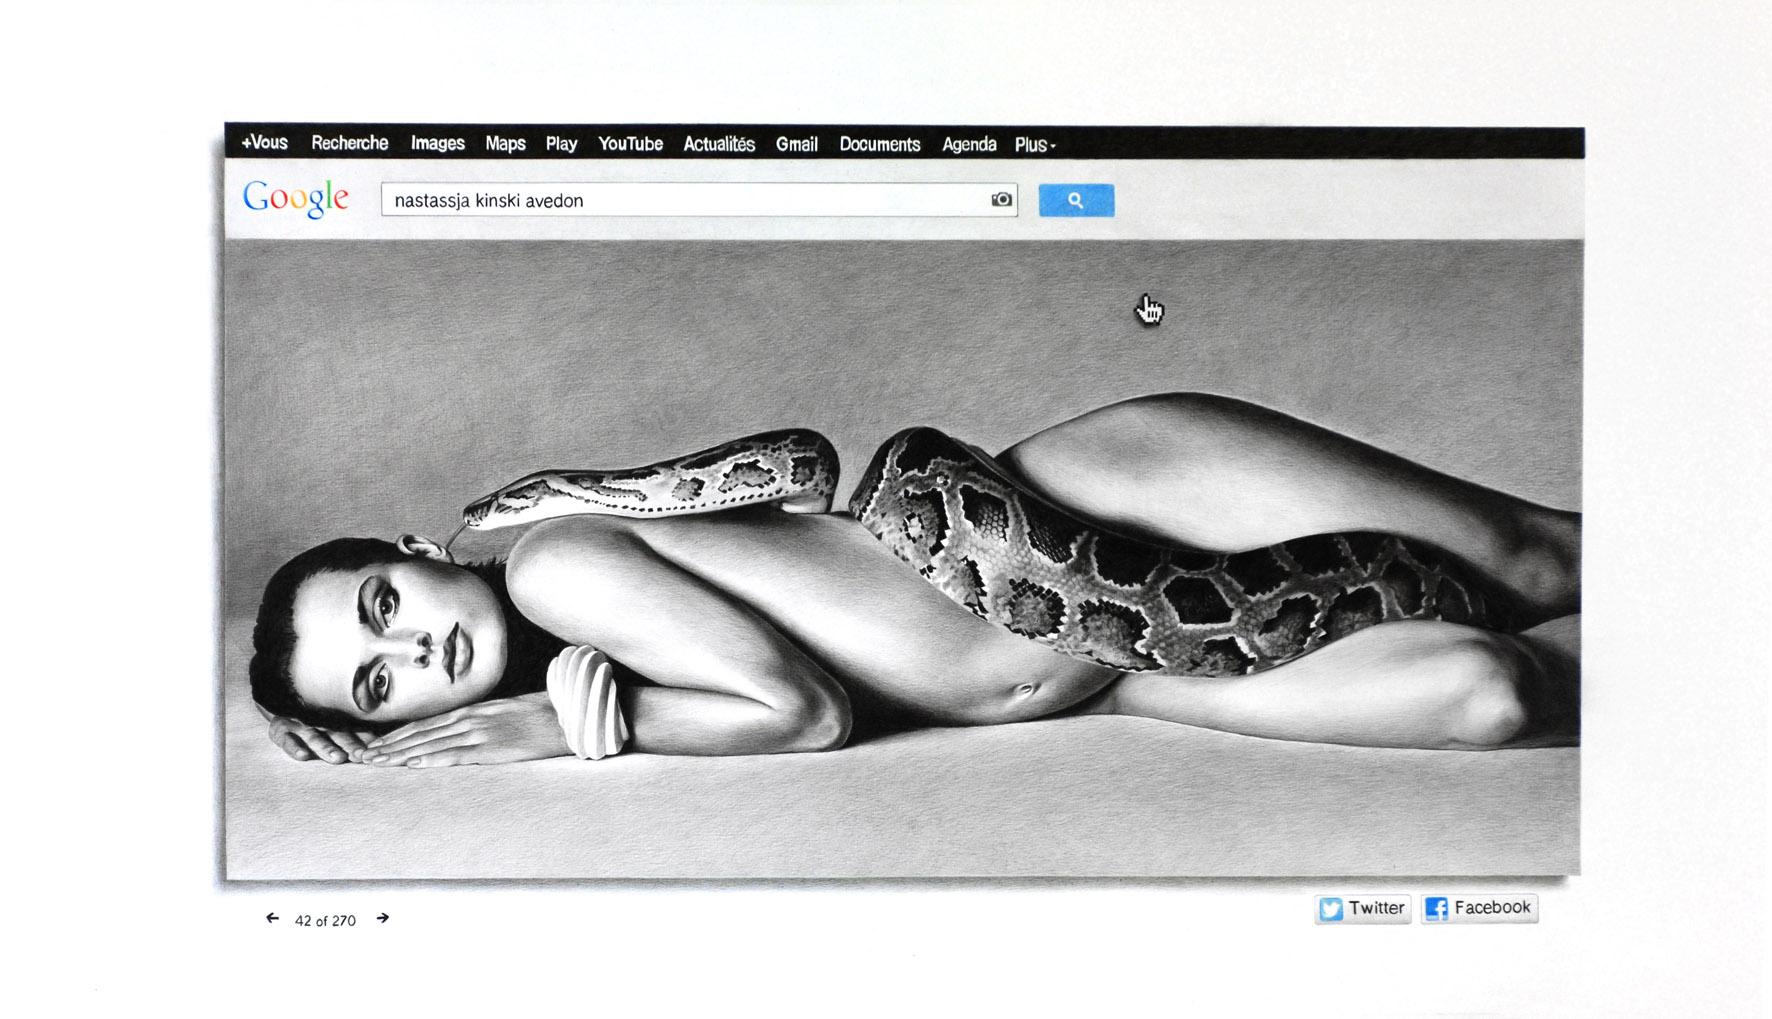 FRANCE BIZOT   Kinski Avedon, 2012. Crayon sur papier \ Pencil on paper. 70 x 121 cm